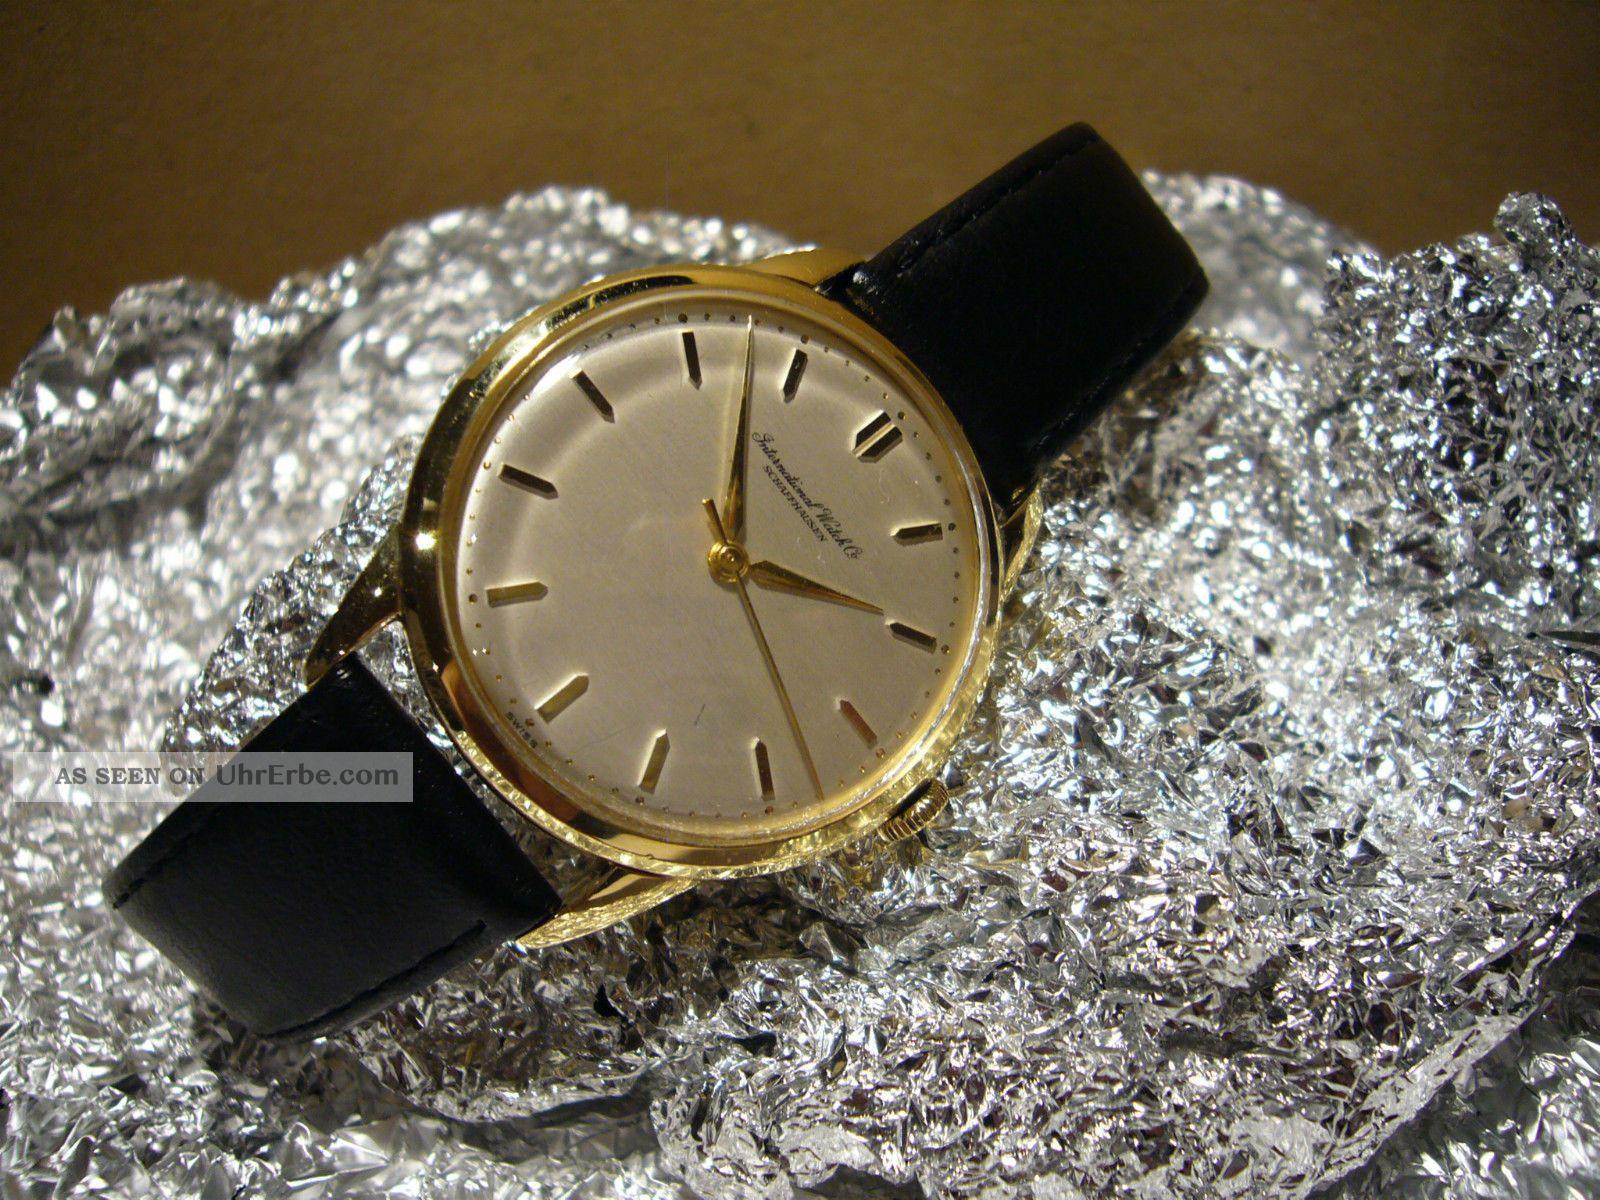 Iwc Schaffhausen 18 Ct.  Gold Handaufzug Kaliber C 89 Armbanduhren Bild